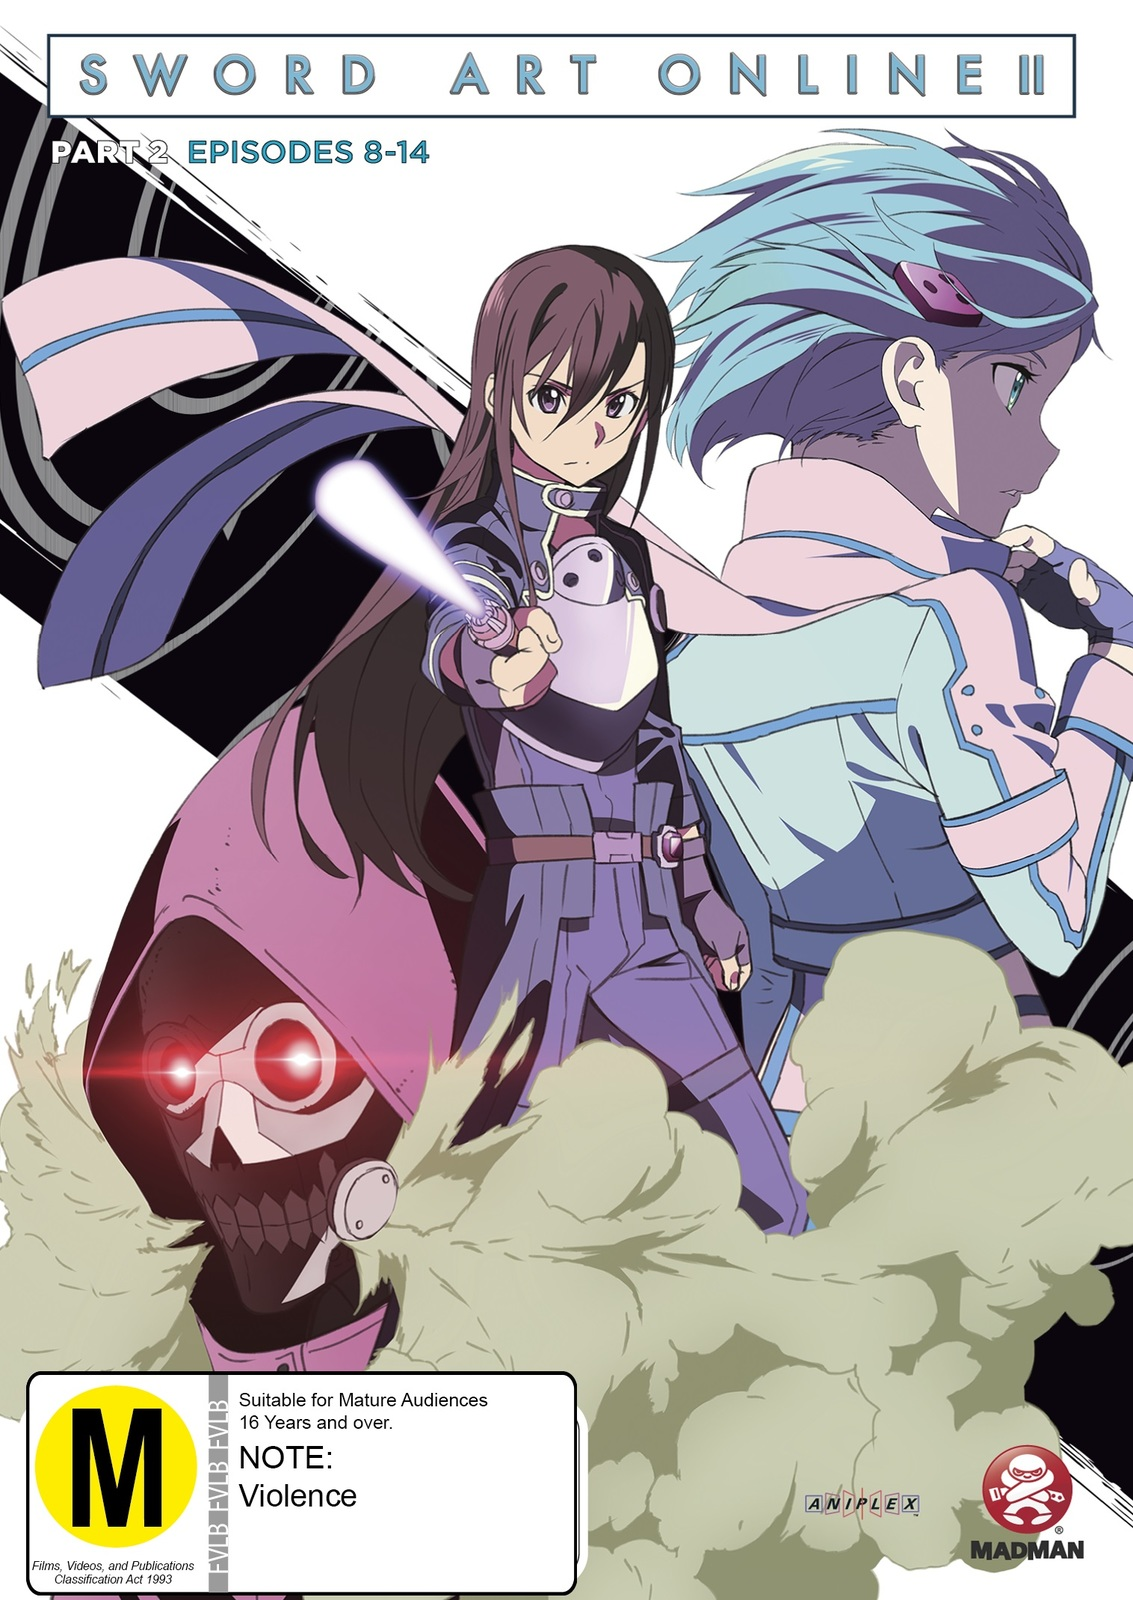 Sword Art Online 2 (Part 2) on DVD image